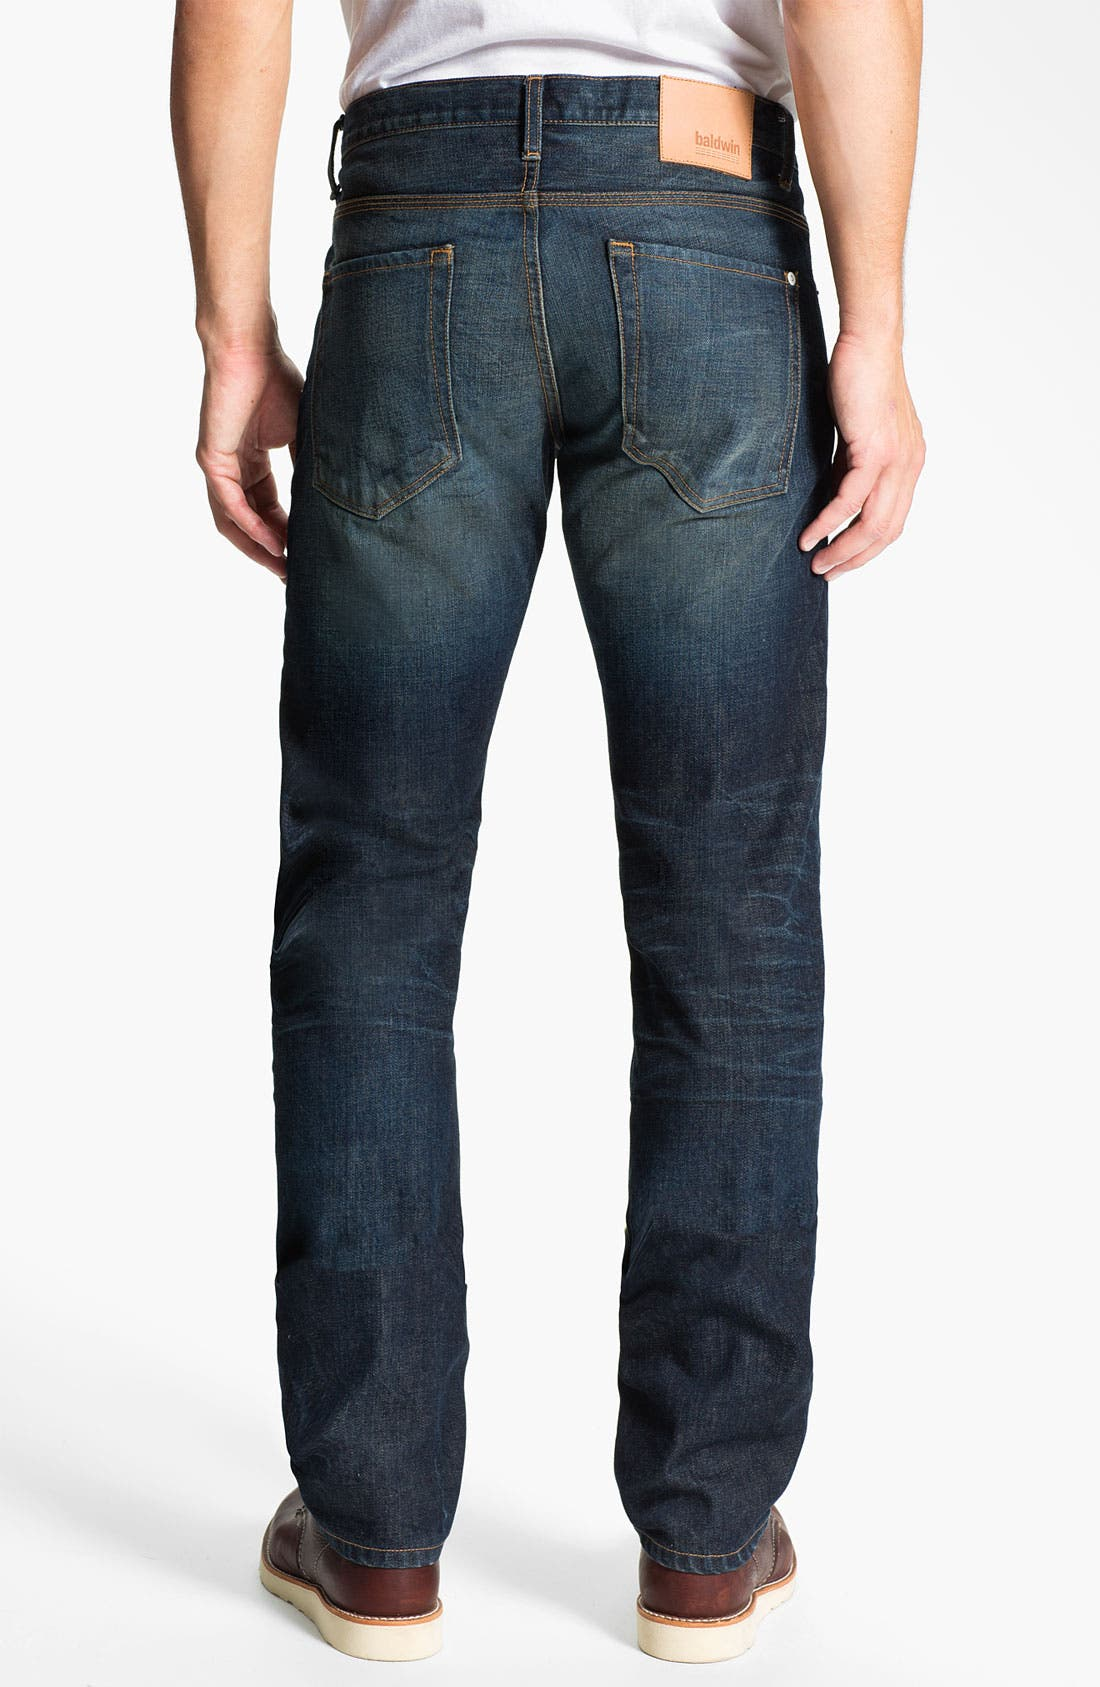 Alternate Image 1 Selected - Baldwin 'Reed' Straight Leg Jeans (John)